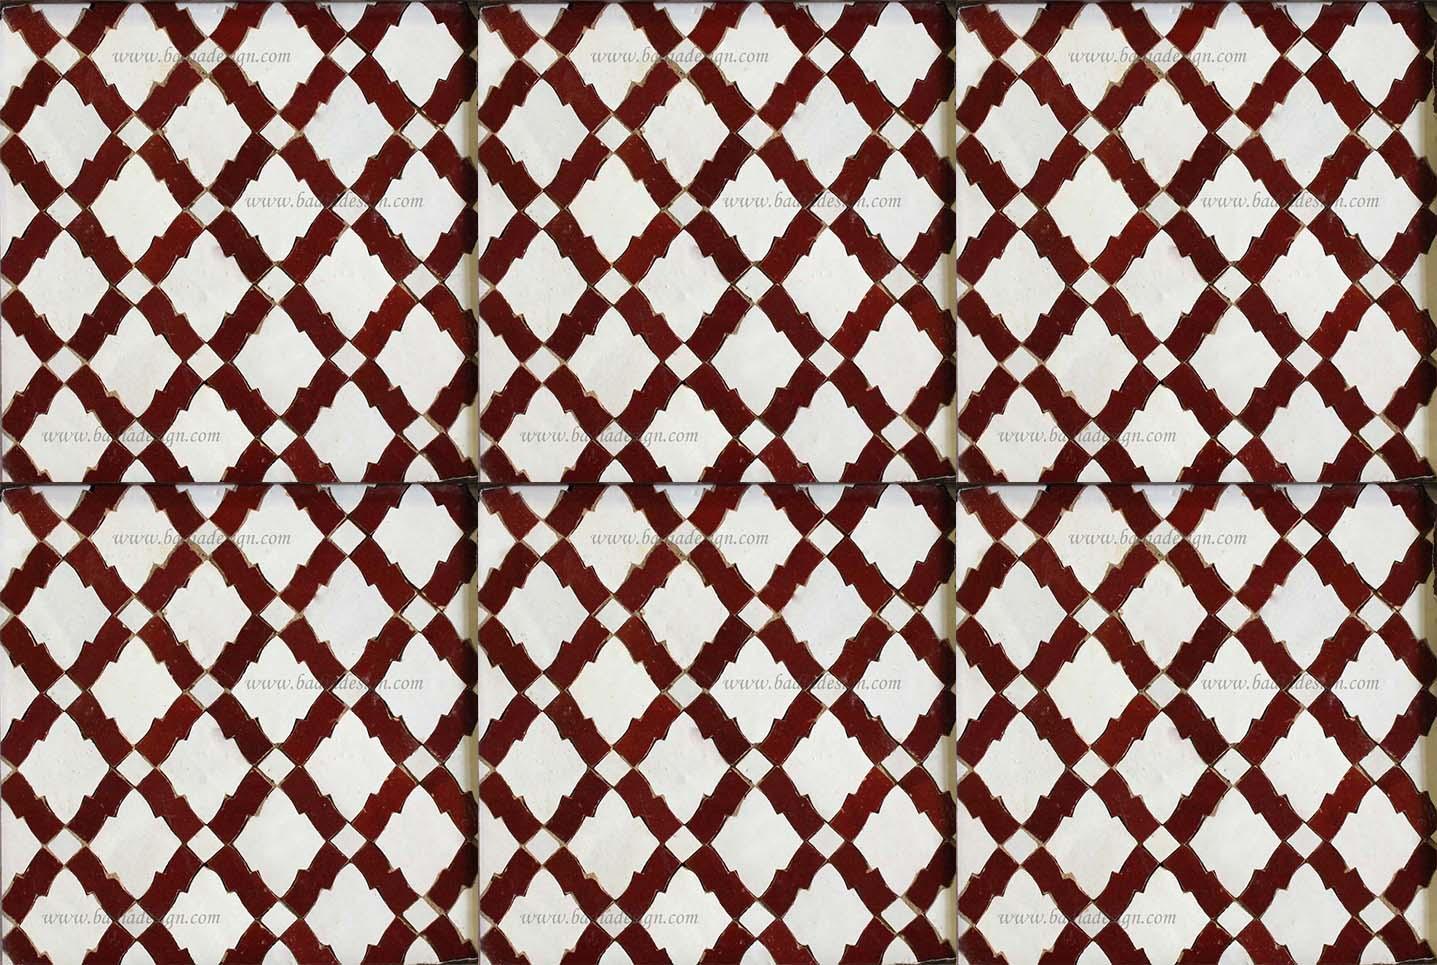 Moroccan mosaic ceramic tile from badia design inc dailygadgetfo Images